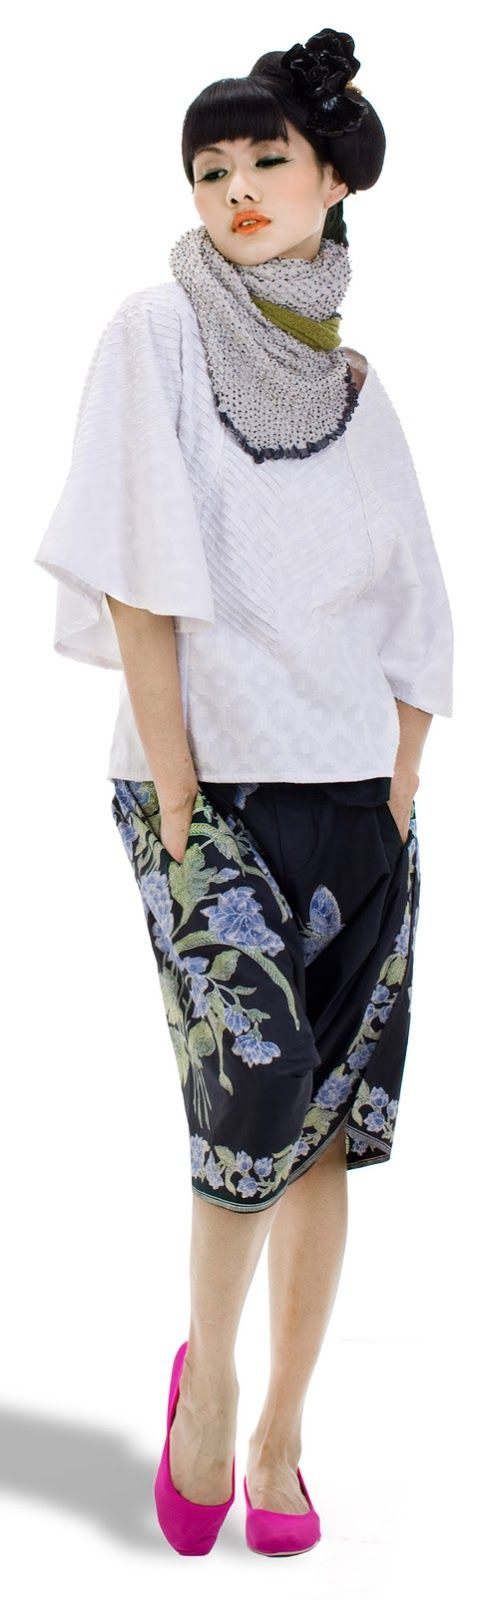 http://www.glowlicious.me/2013/08/36-fashion-looks-oscar-lawalata.html